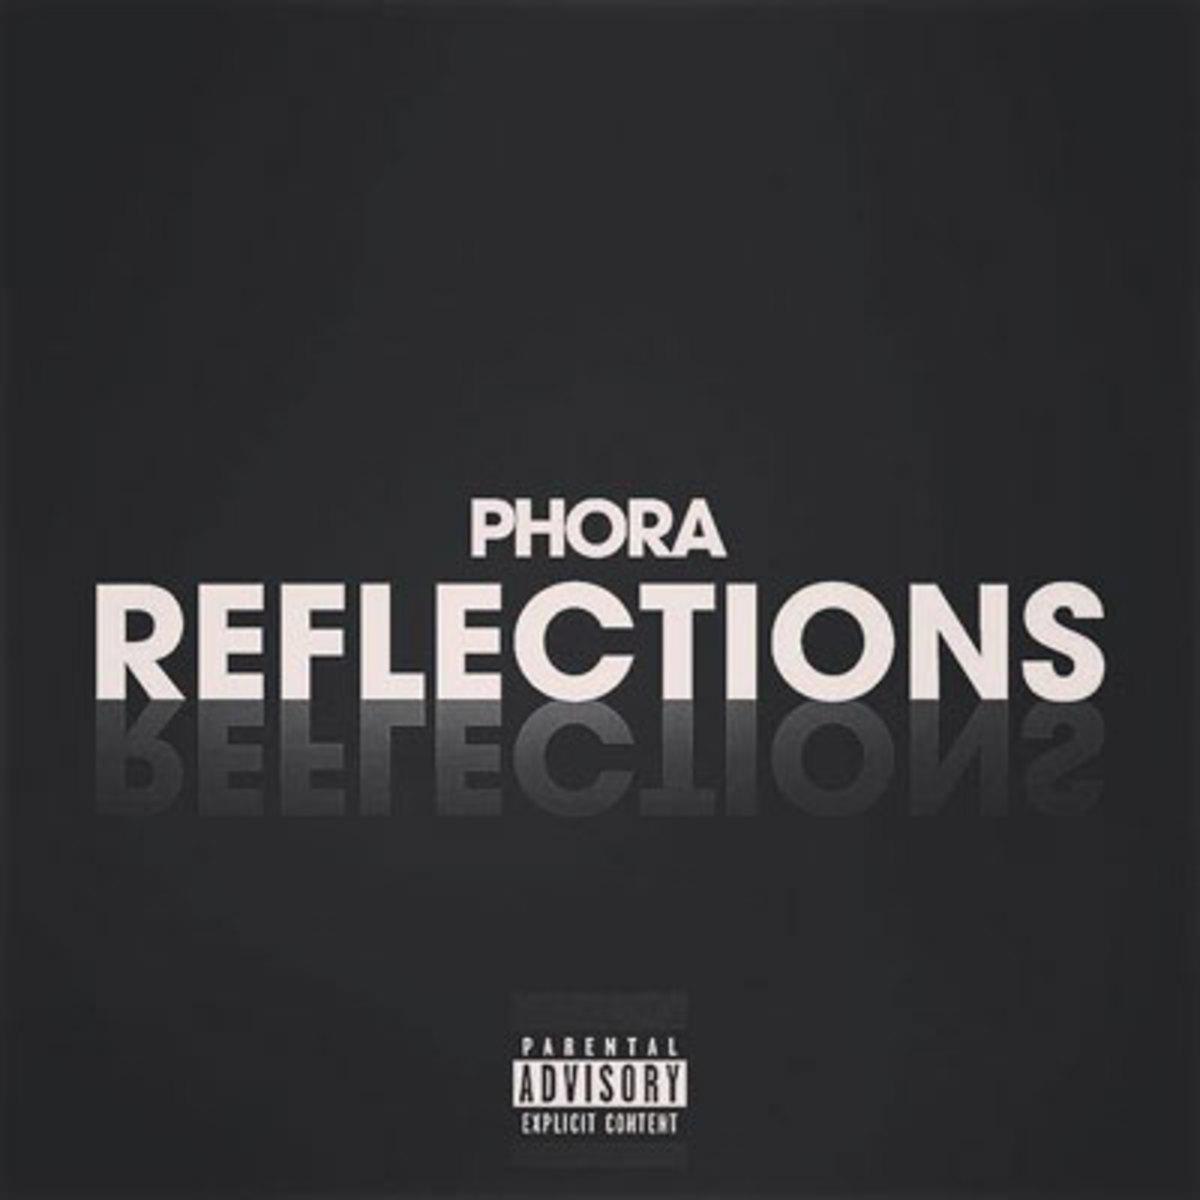 phora-reflections.jpg